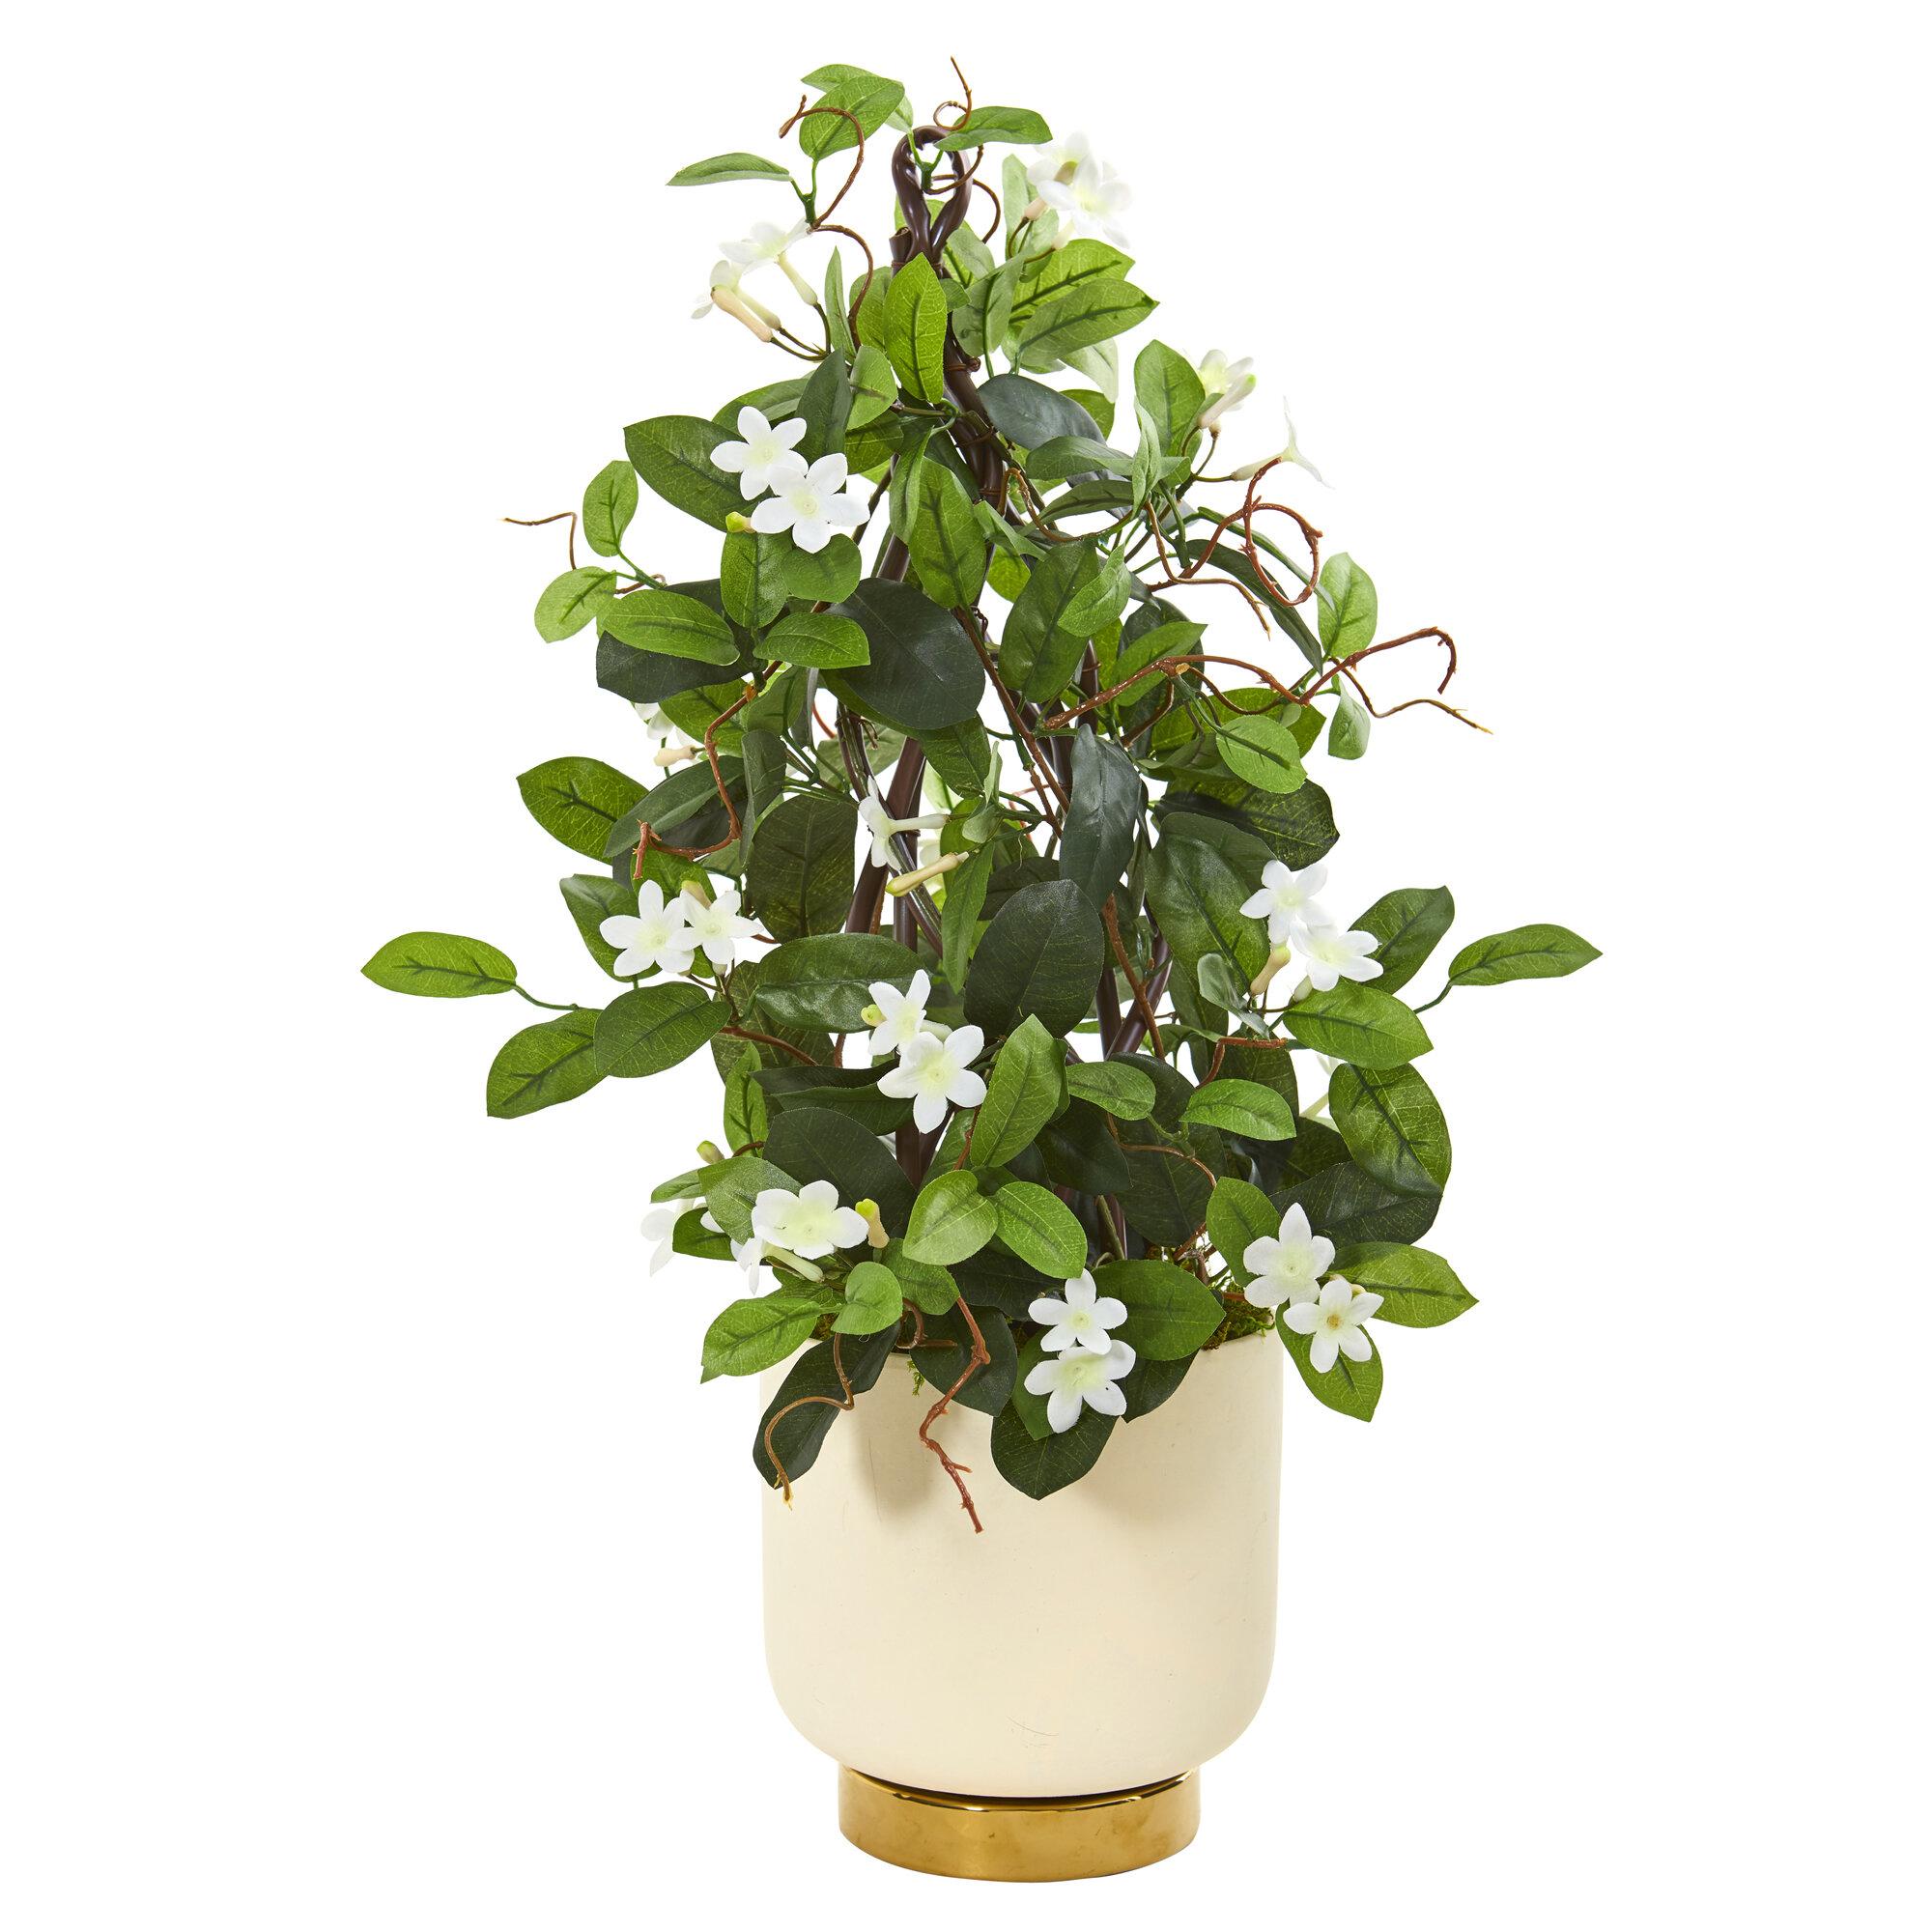 Mercer41 Artificial Stephanotis Plant In Planter Wayfair